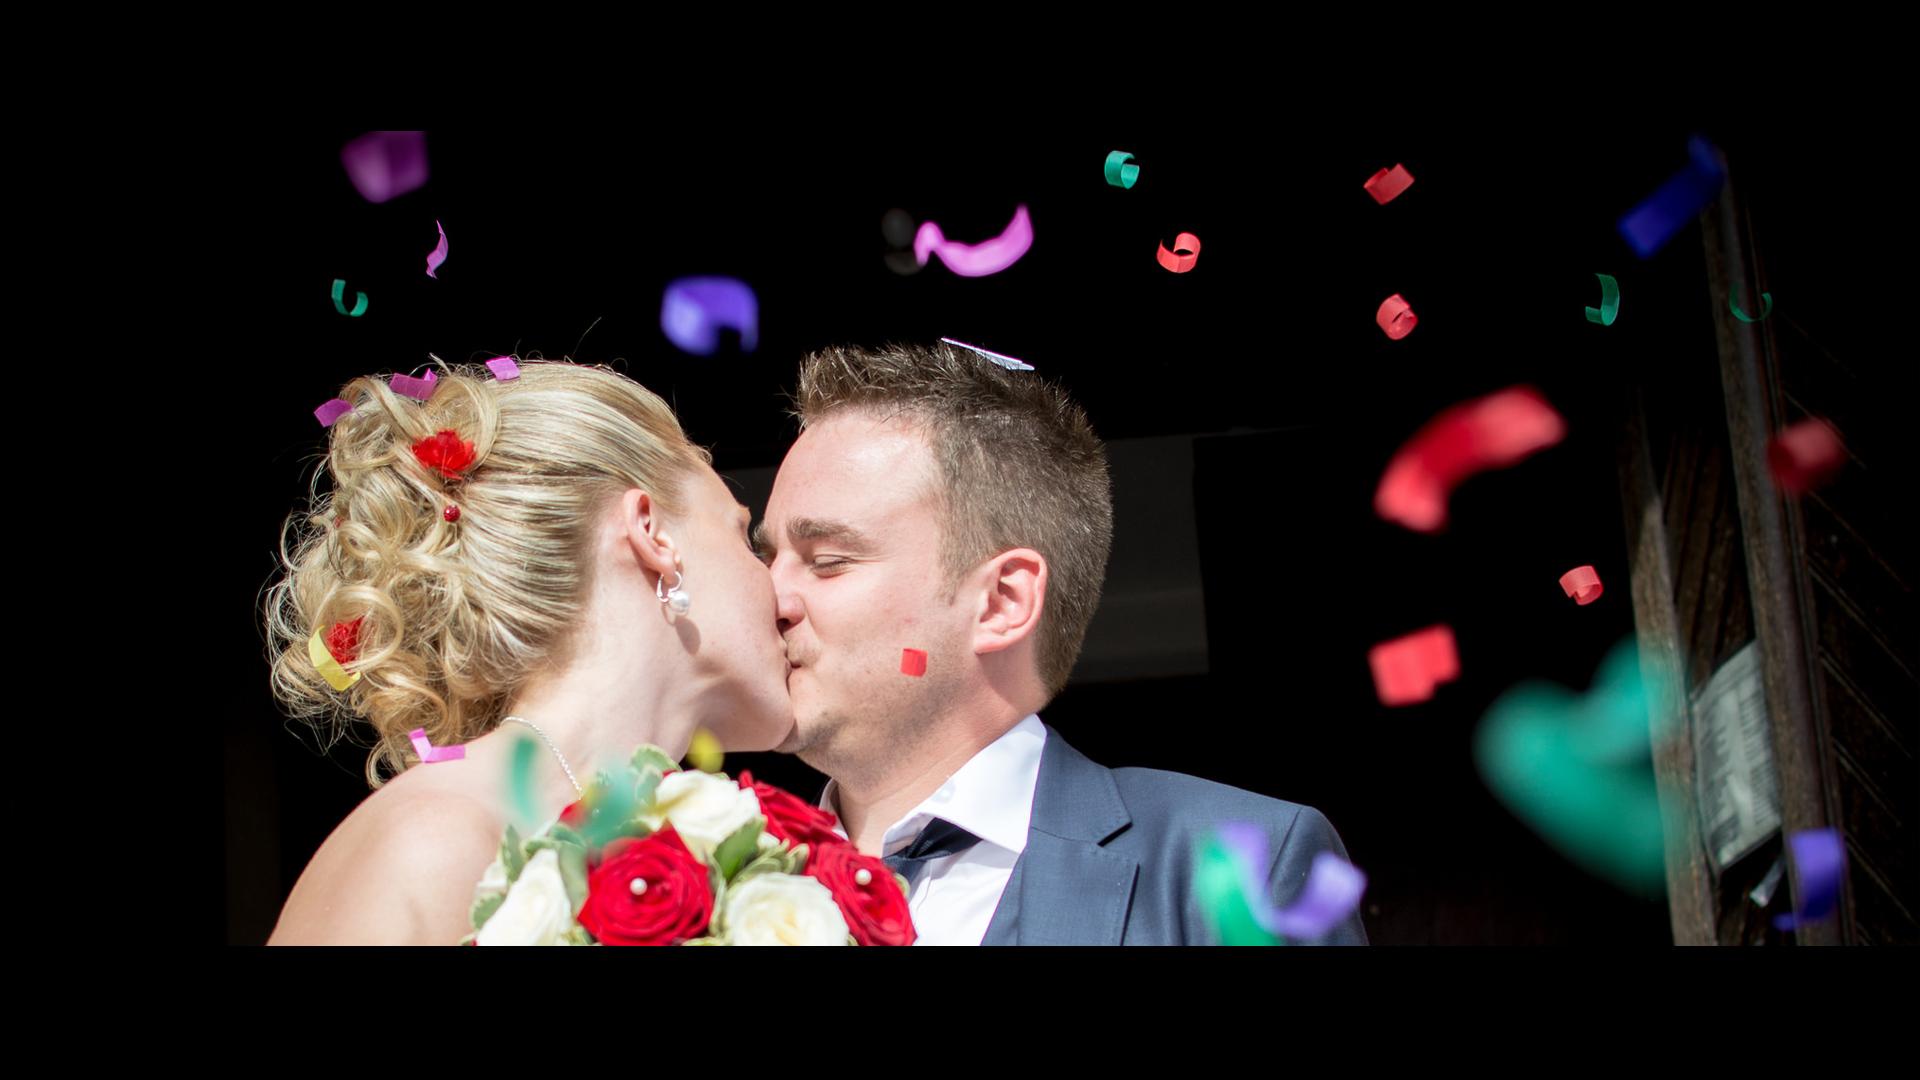 vidéaste de mariage - blog videaste mariage - histoires de mariages - video mariage